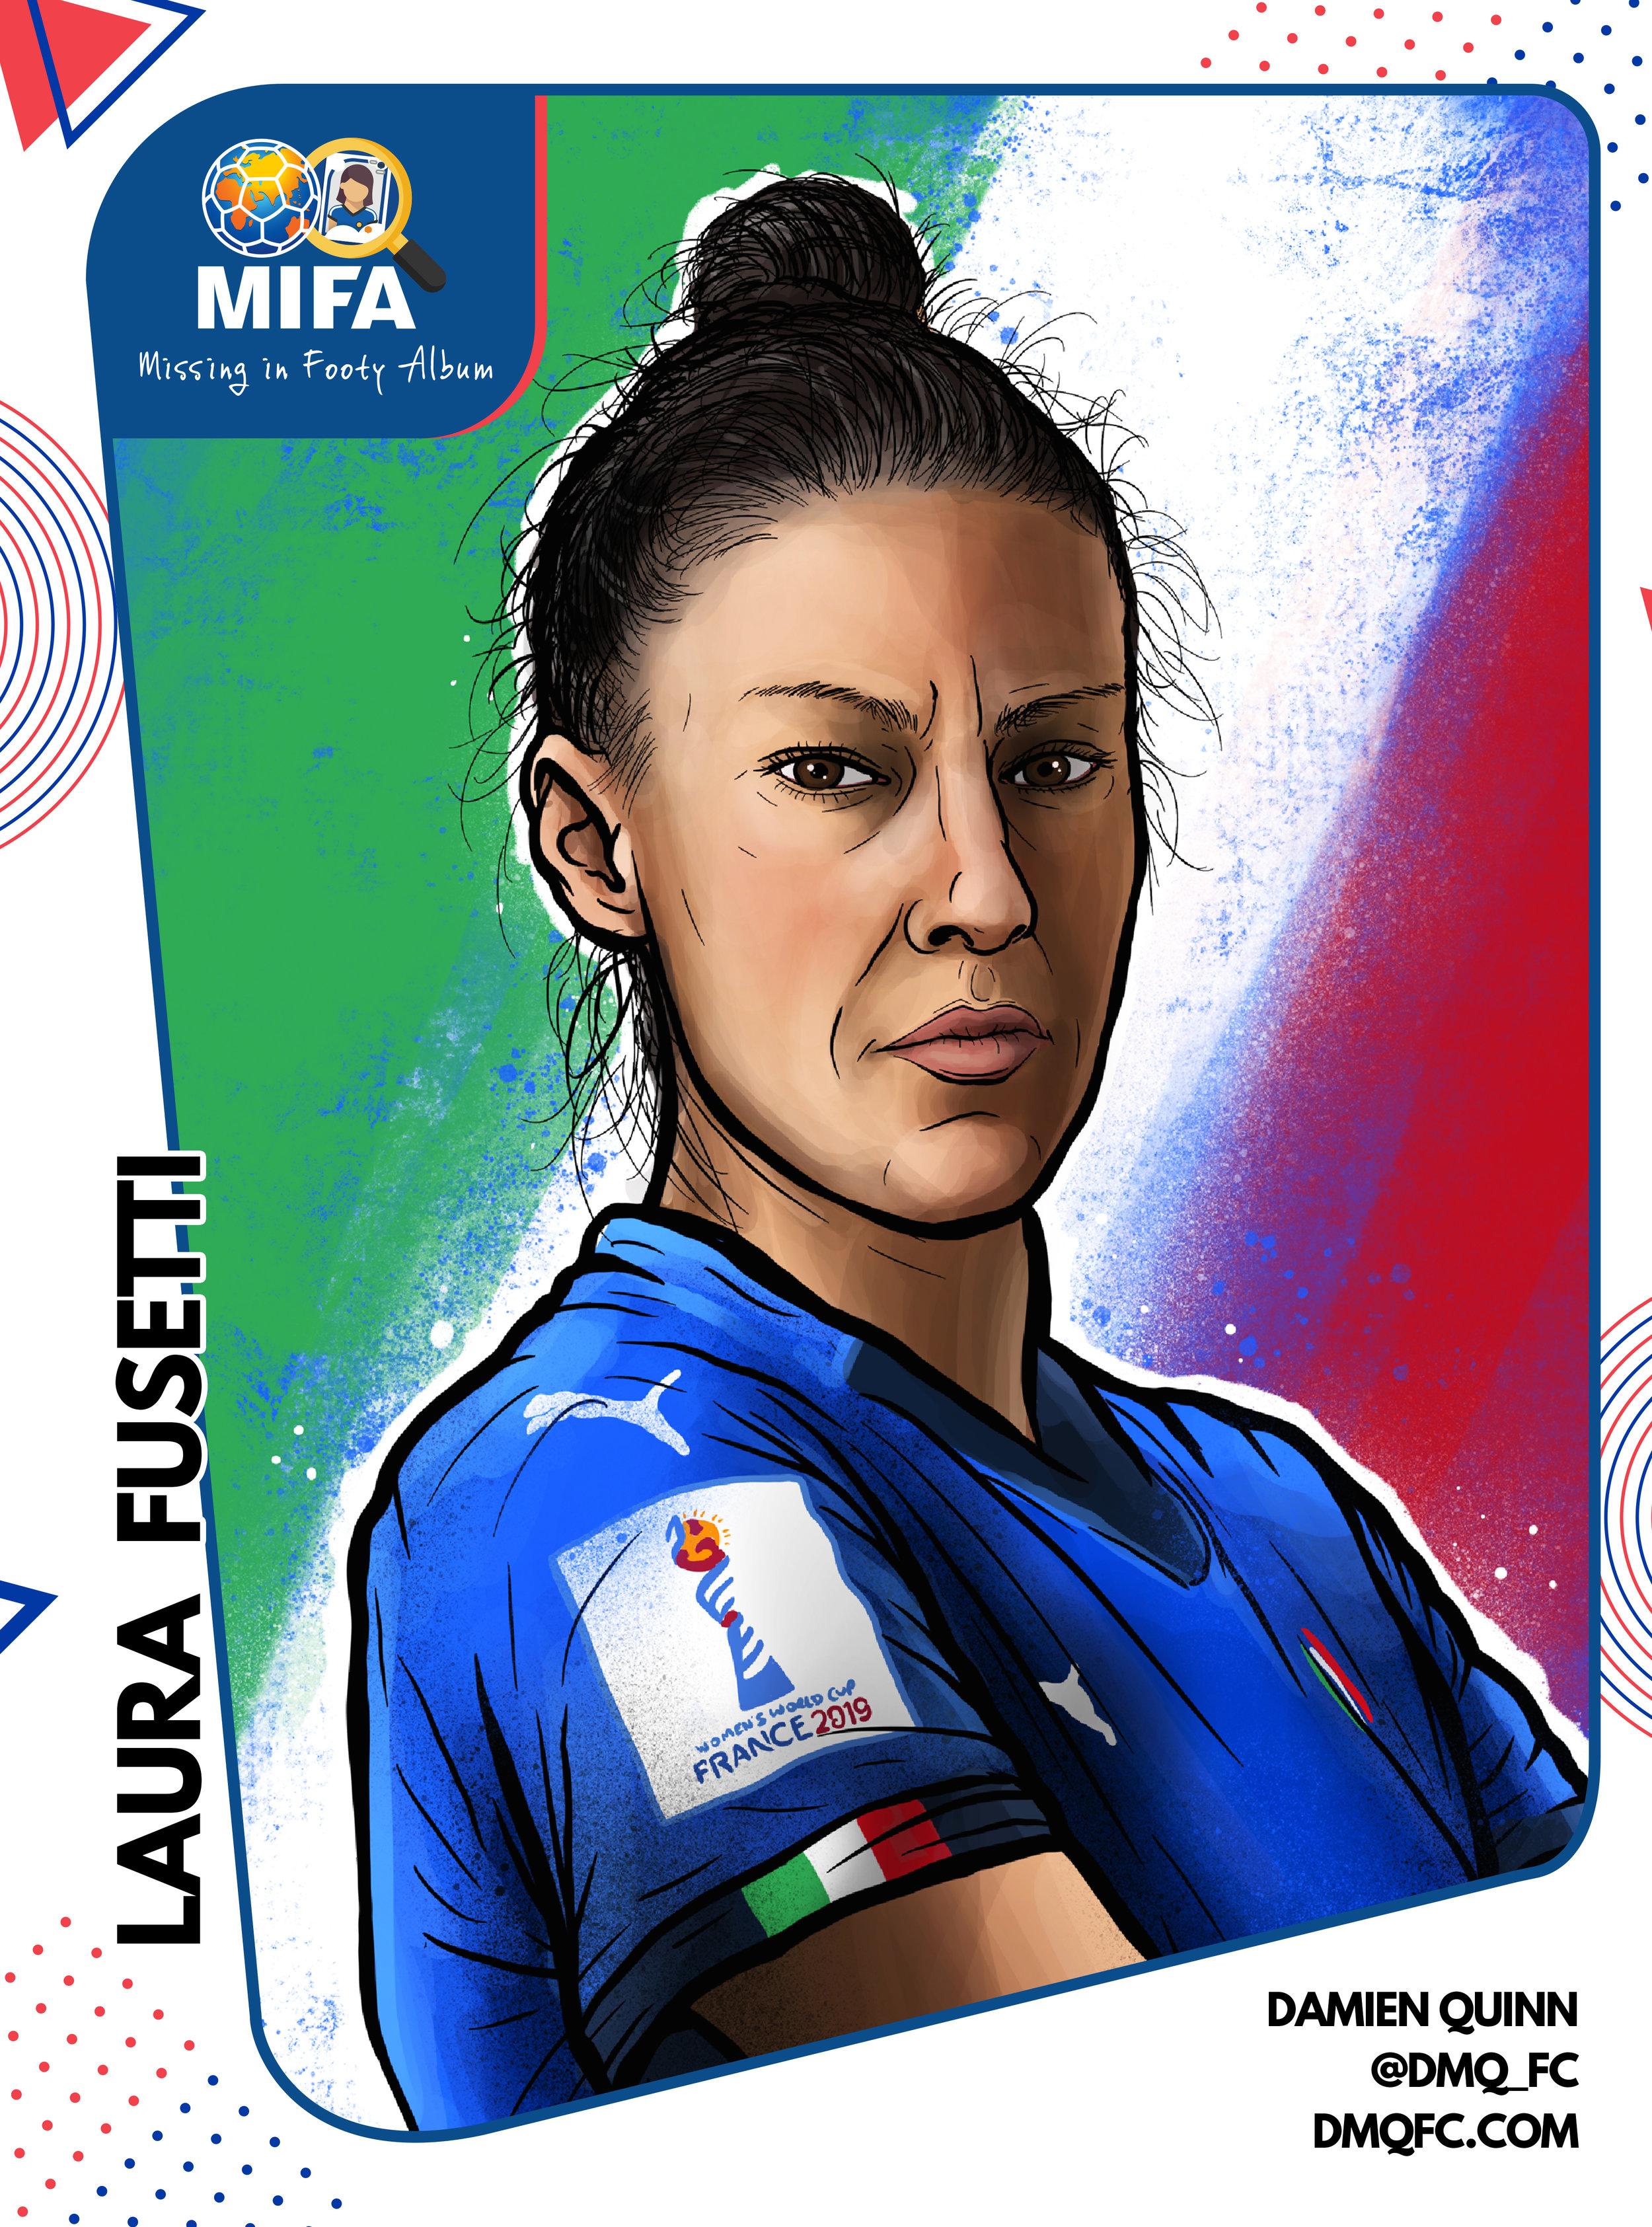 Laura Fusetti_Italy_MIFA 2019_Damien Quinn.jpg